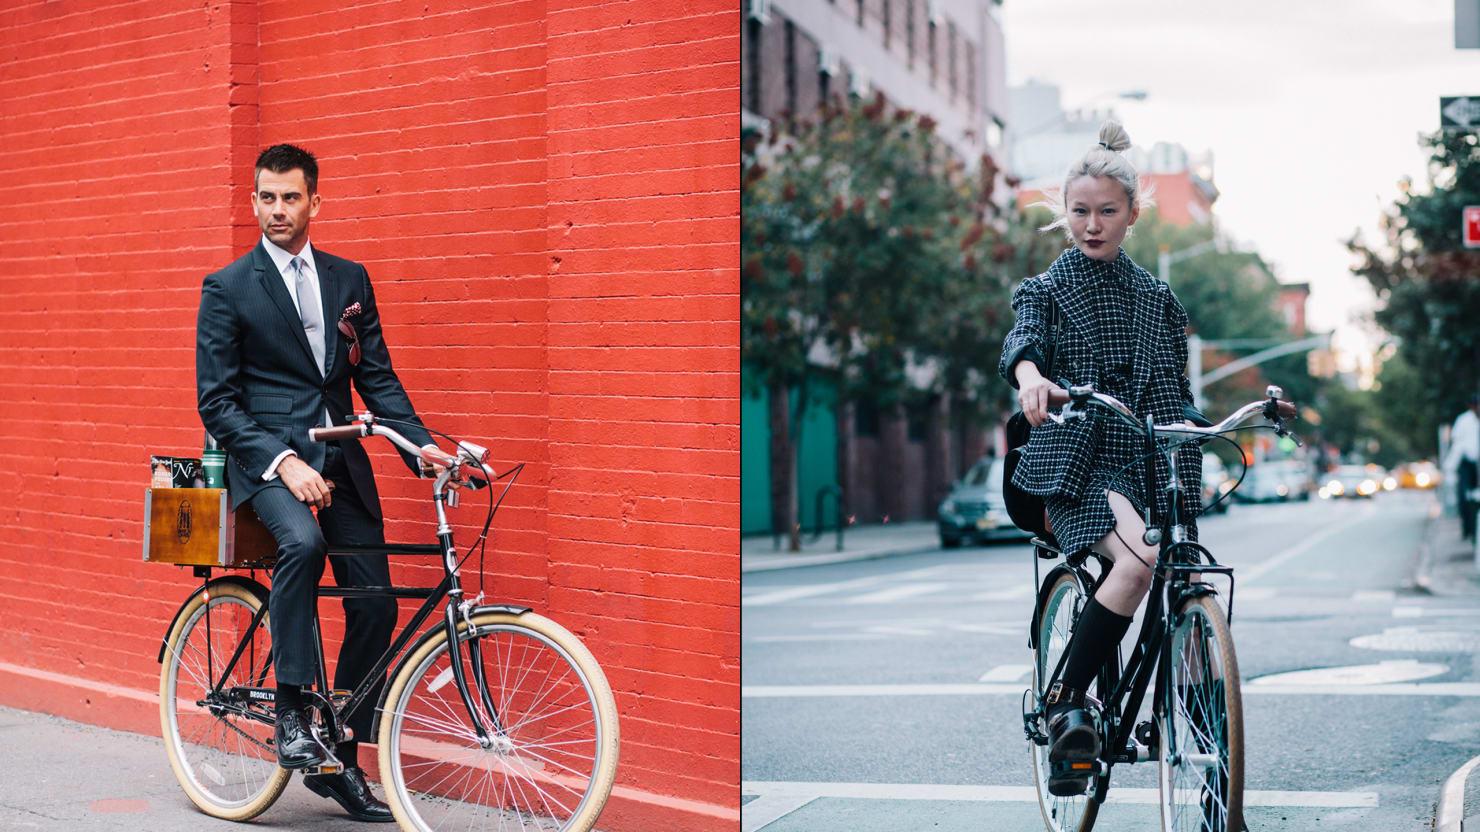 Badass New York Bike Style (Photos)